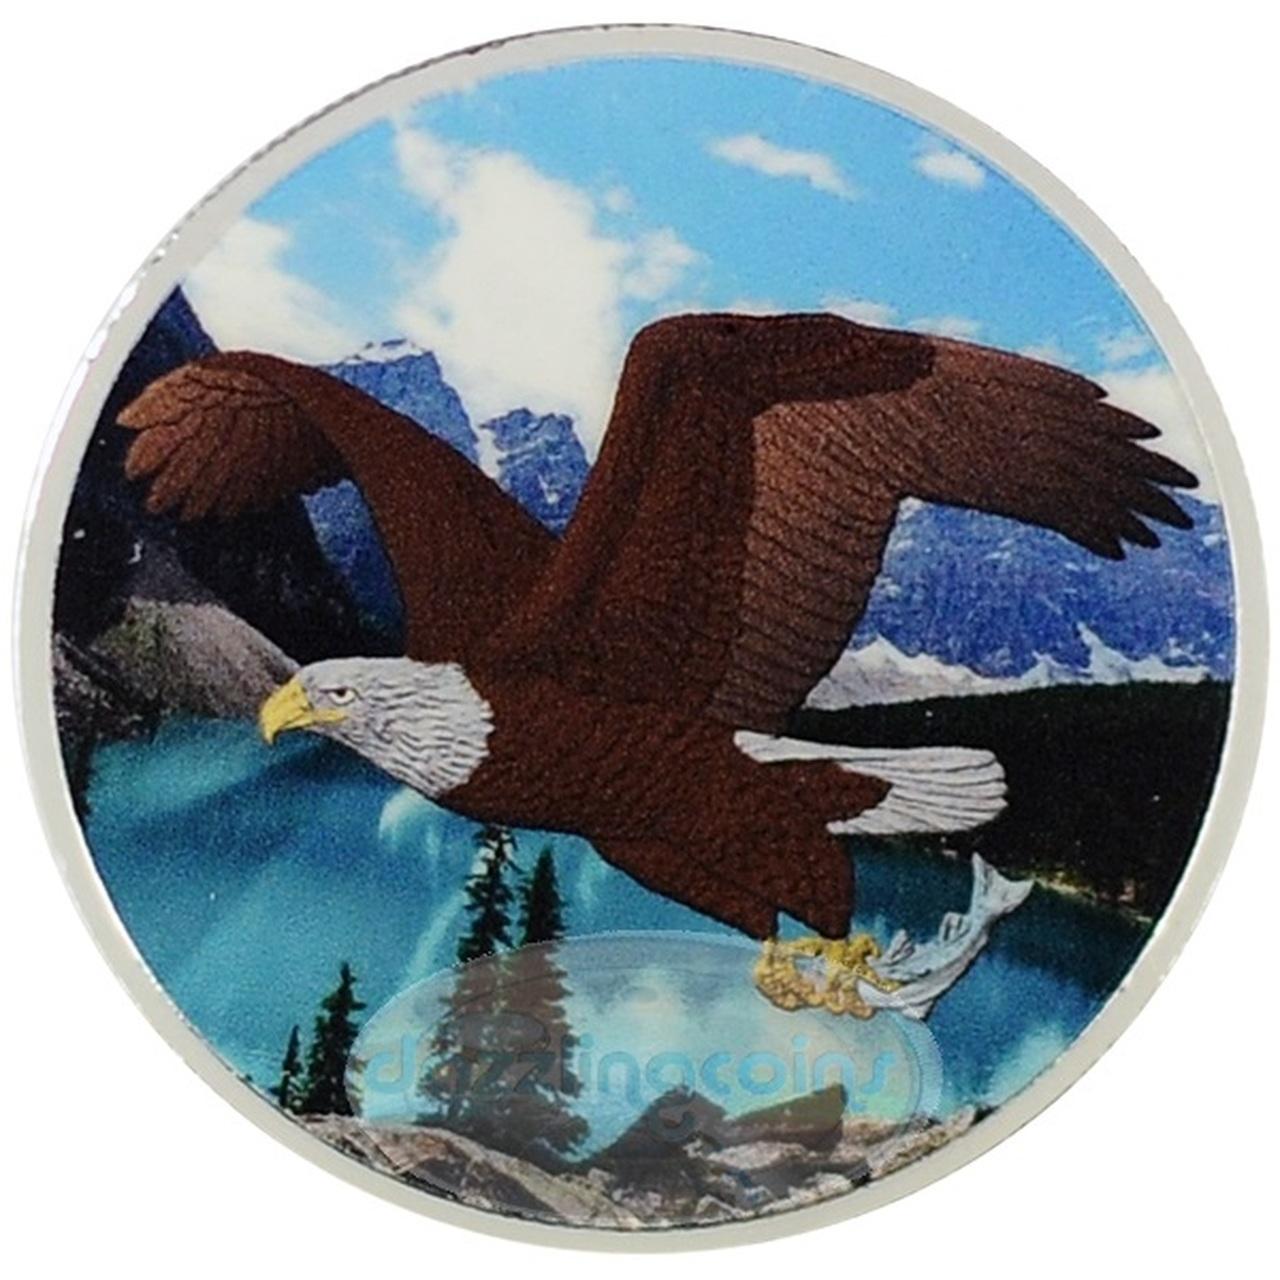 2014 Silver 1 oz Canada Birds of Prey Bald Eagle